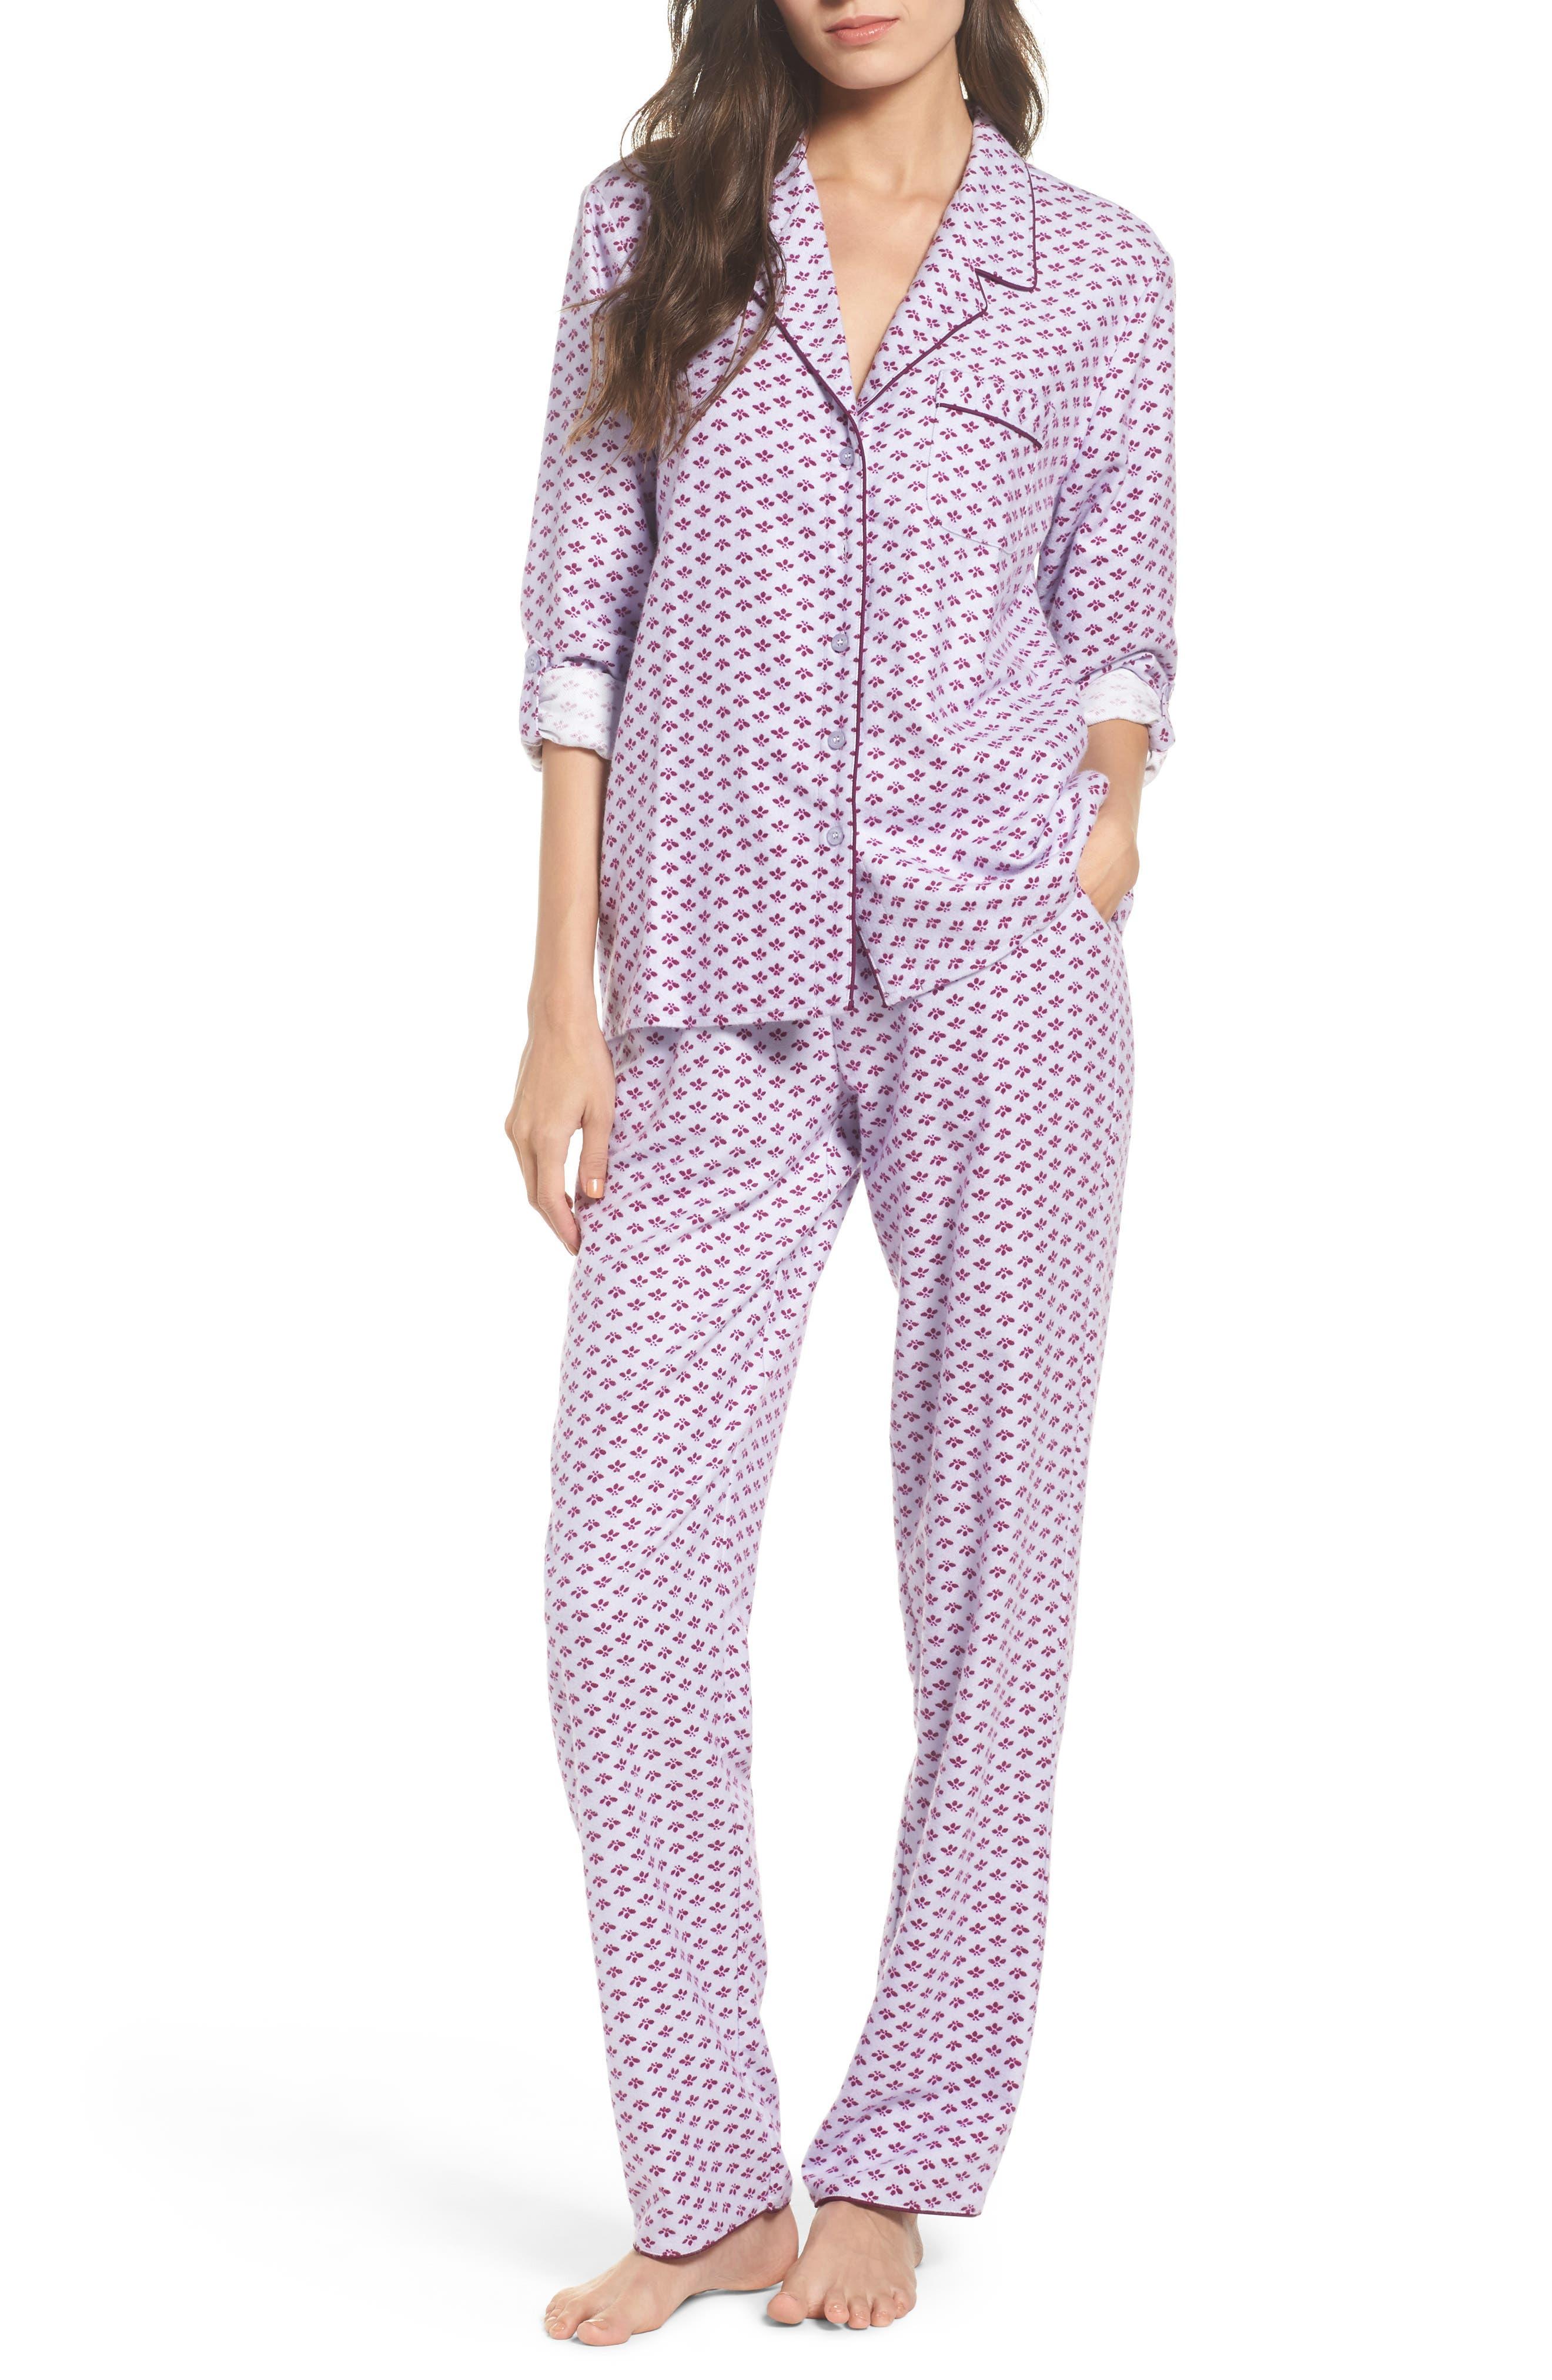 Lingerie Starlight Flannel Pajamas,                             Main thumbnail 4, color,